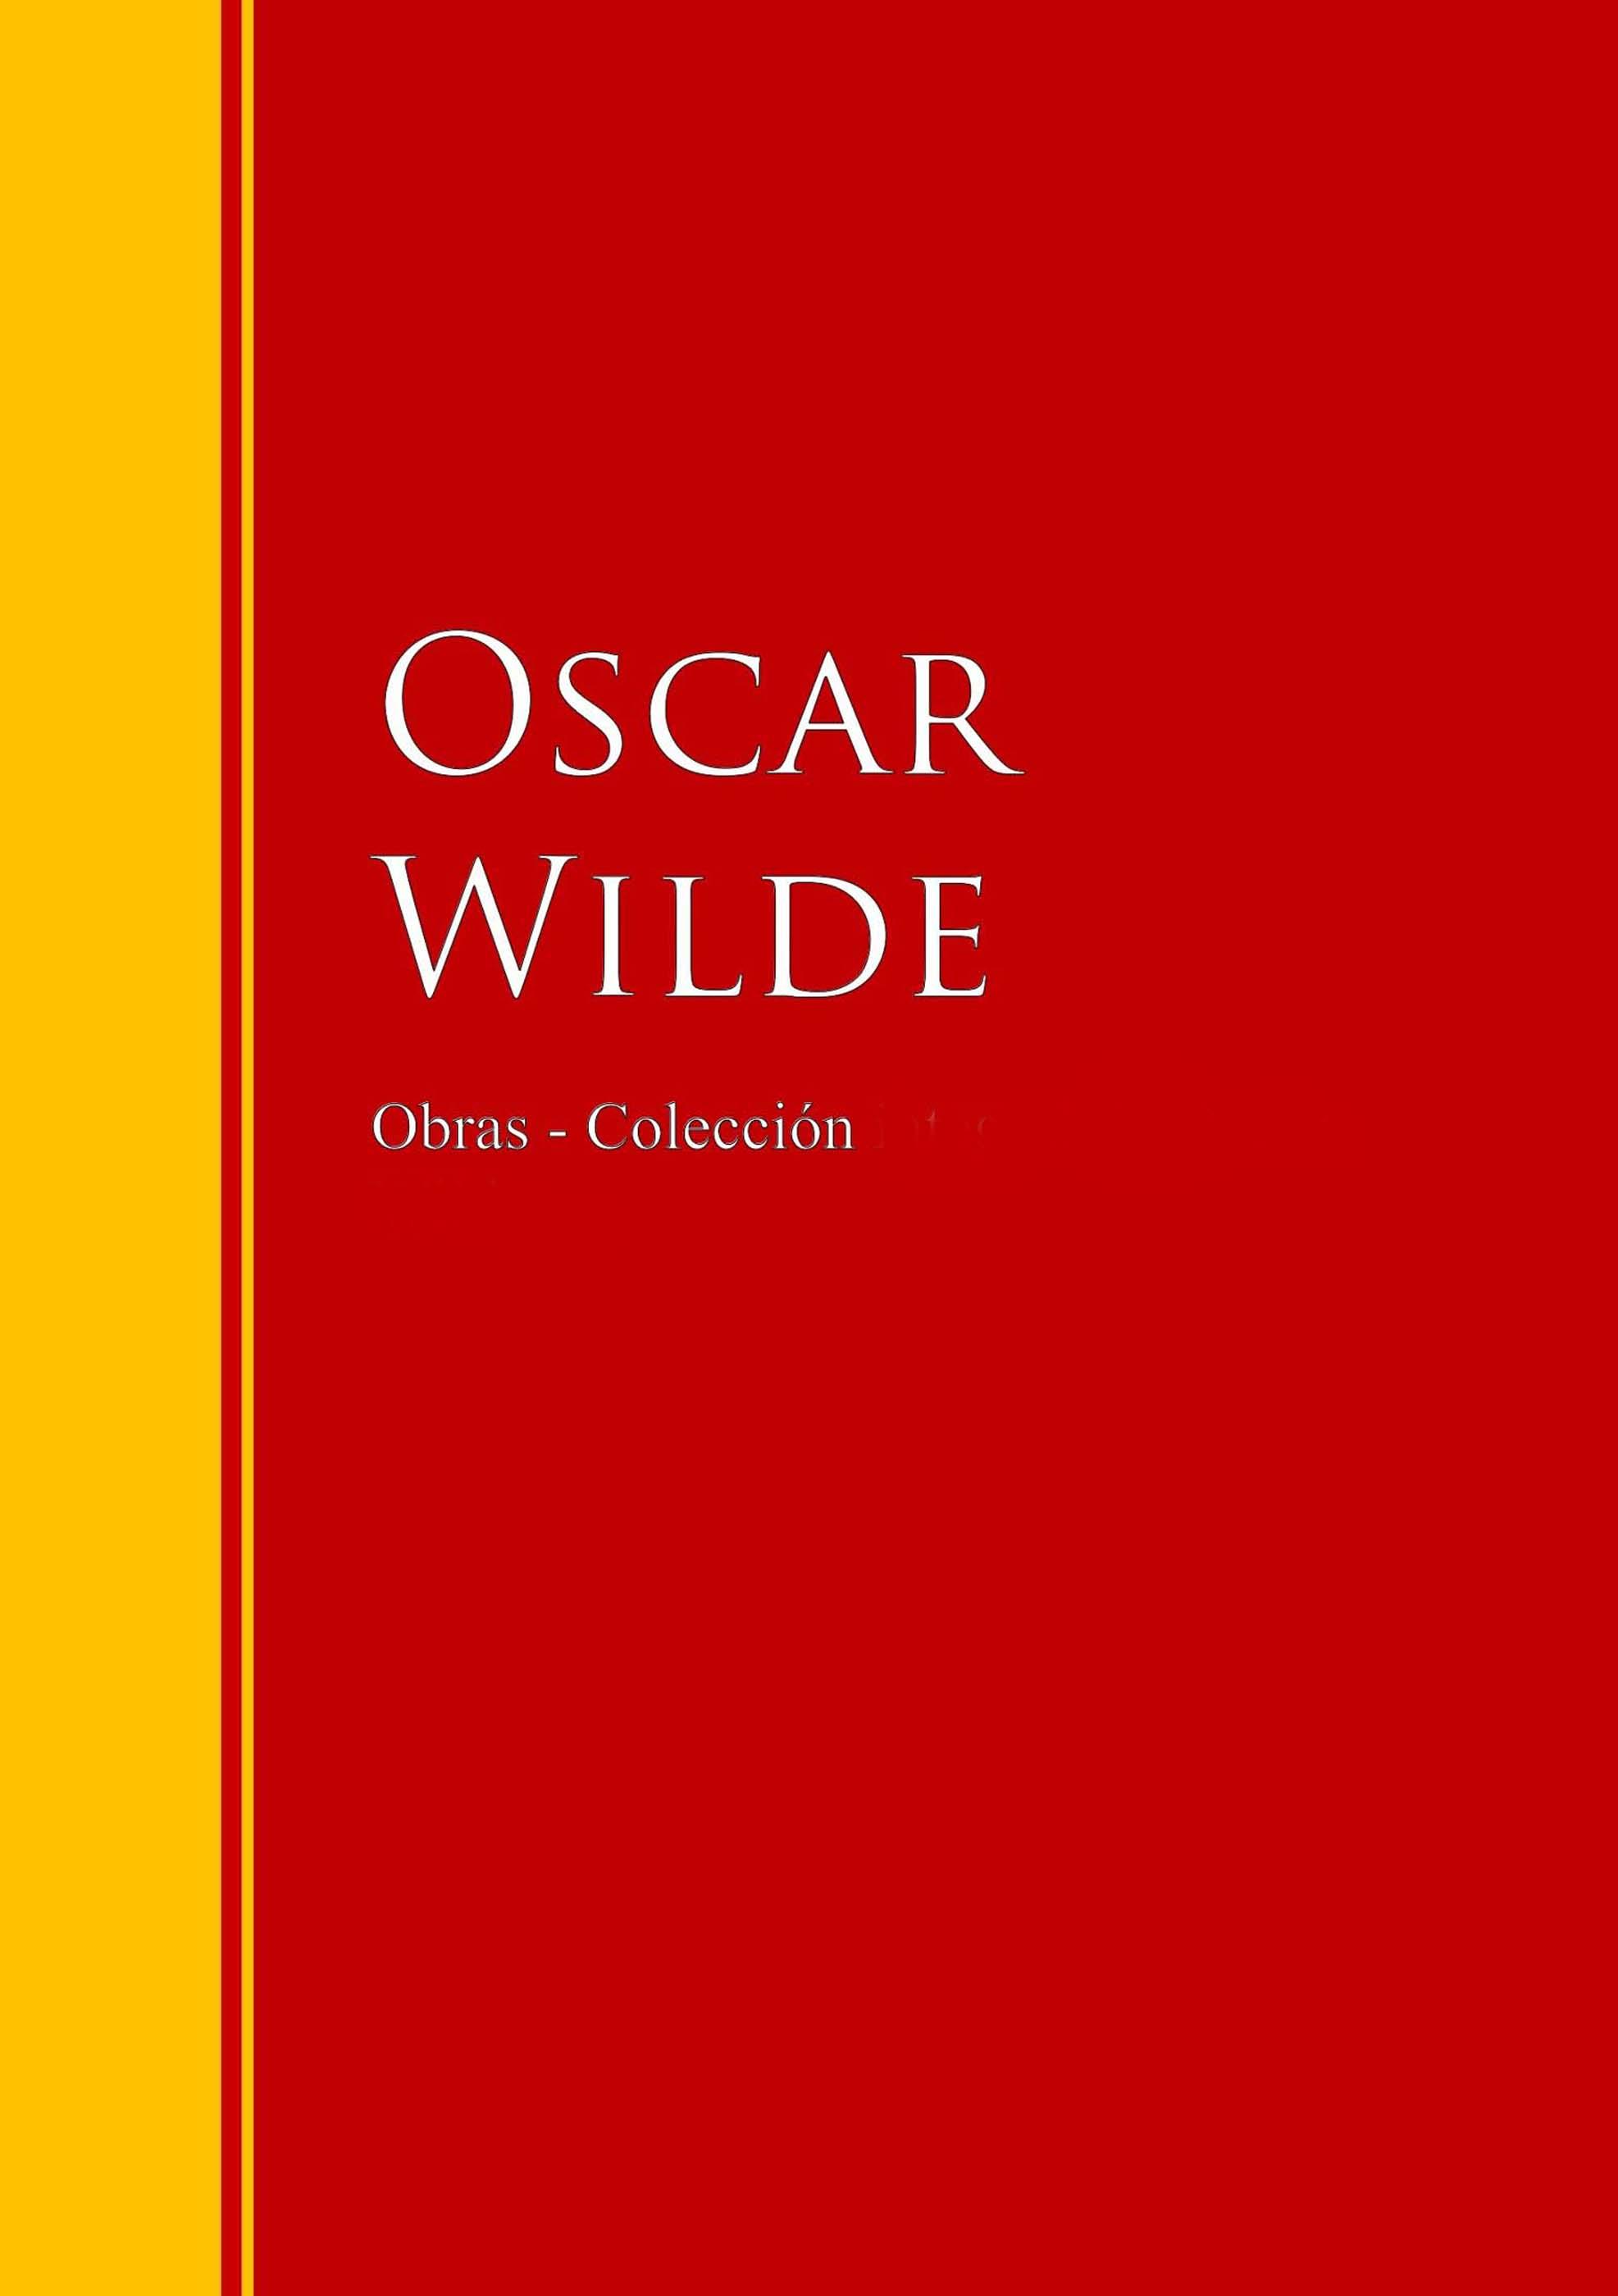 Oscar Wilde Las Obras de Oscar Wilde oscar wilde complete works of oscar wilde